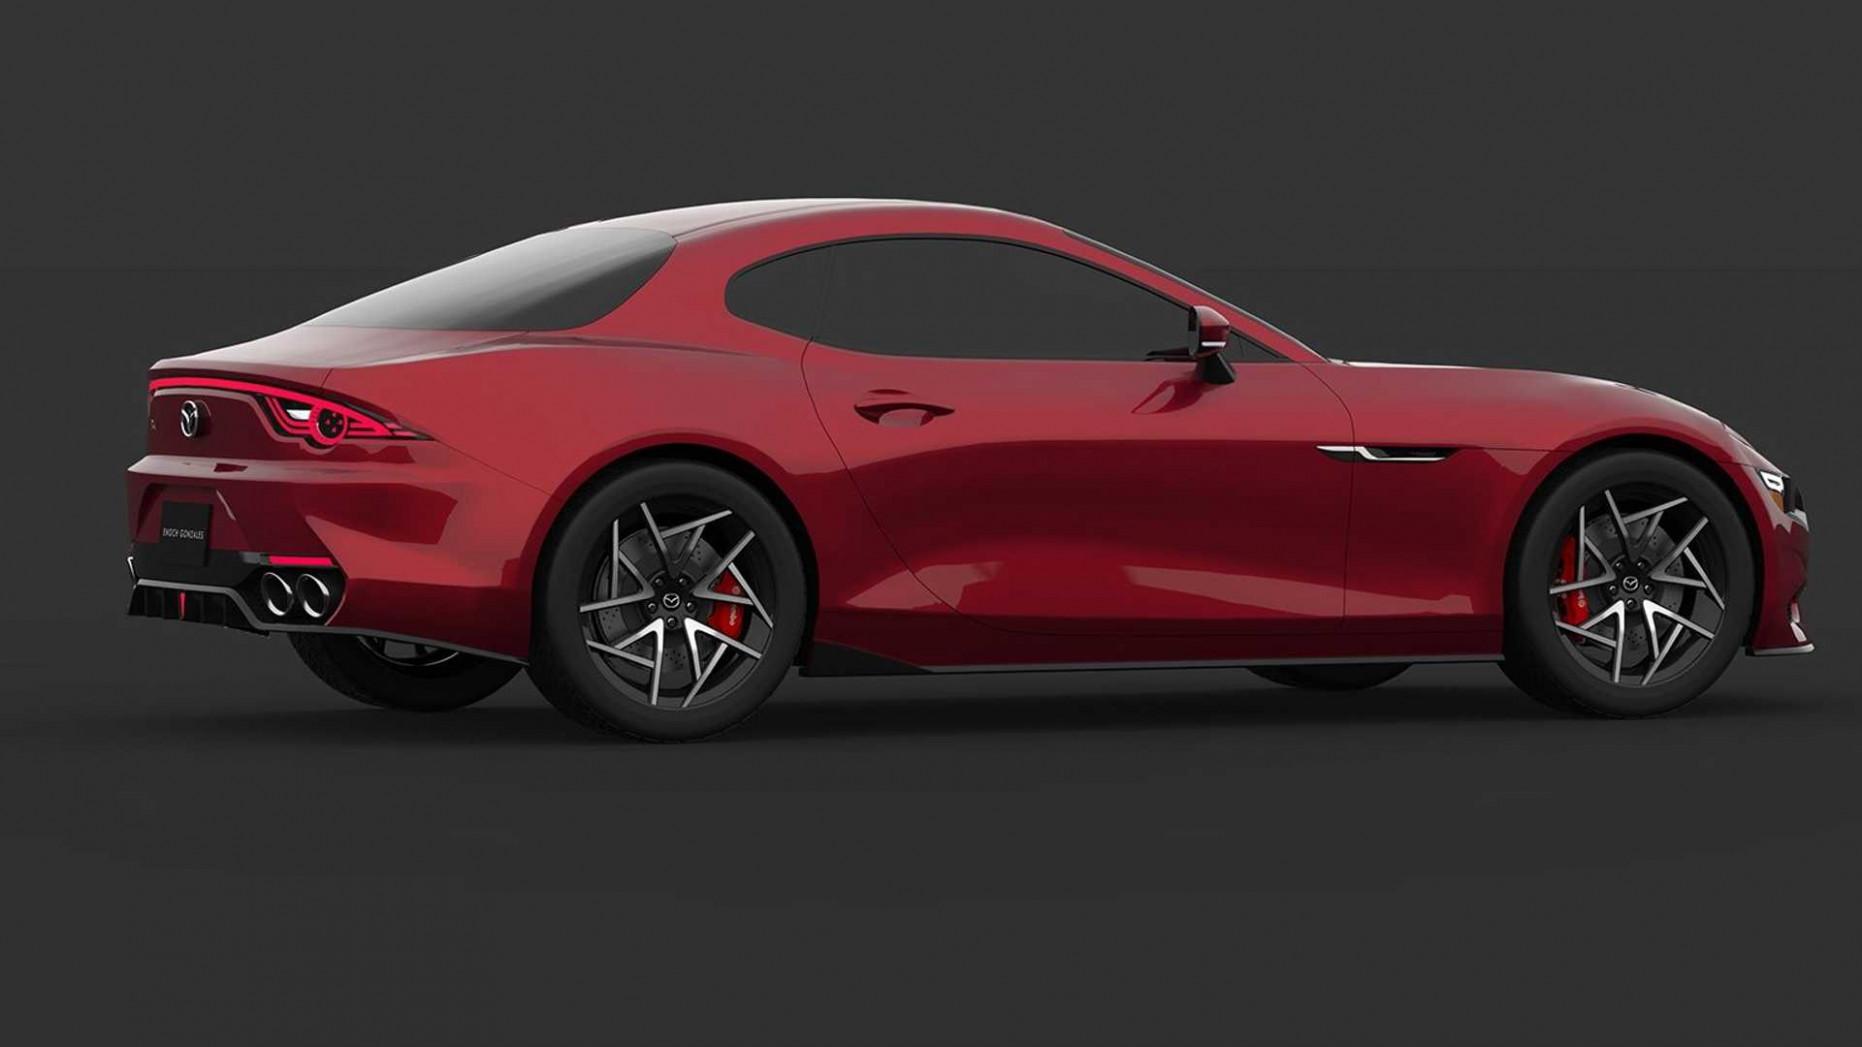 Exterior and Interior 2022 Mazda RX7s